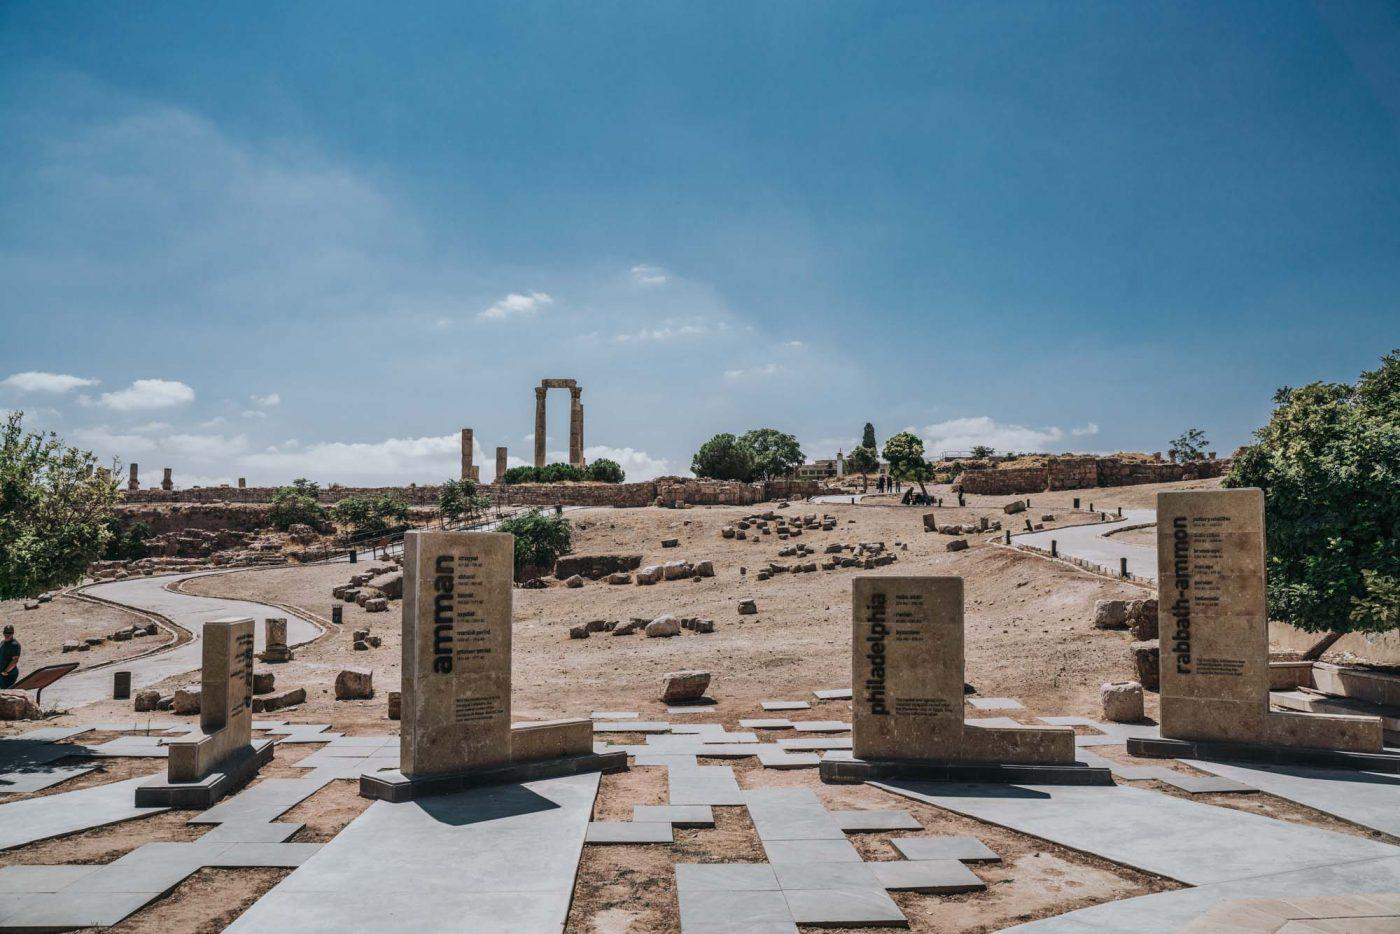 Things to do in Jordan: Archaeological site of the Citadel, Amman, Jordan